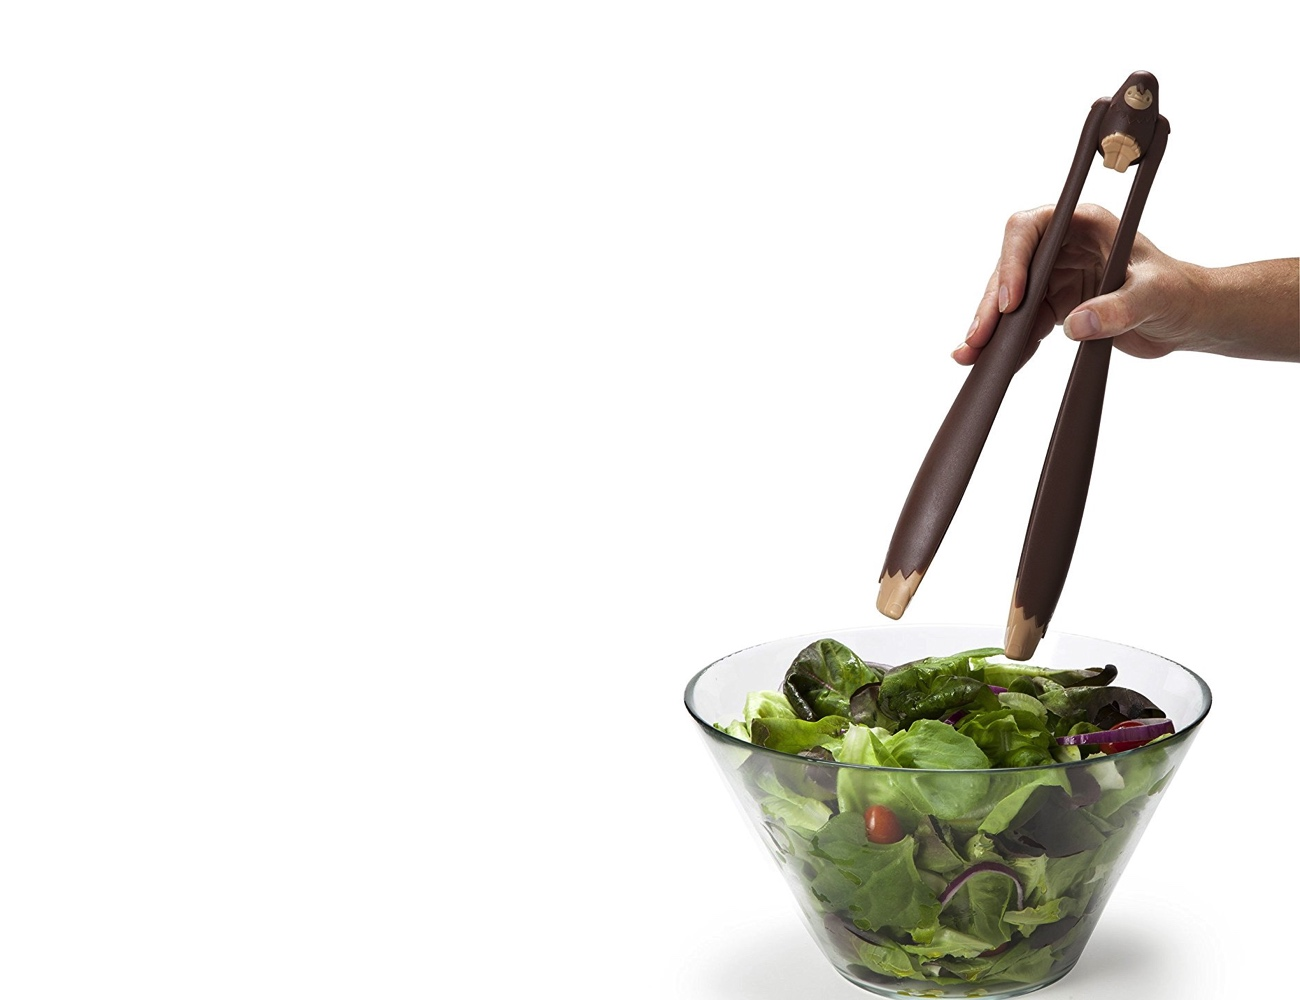 OTOTO Bigfoot Salad Serving Tongs